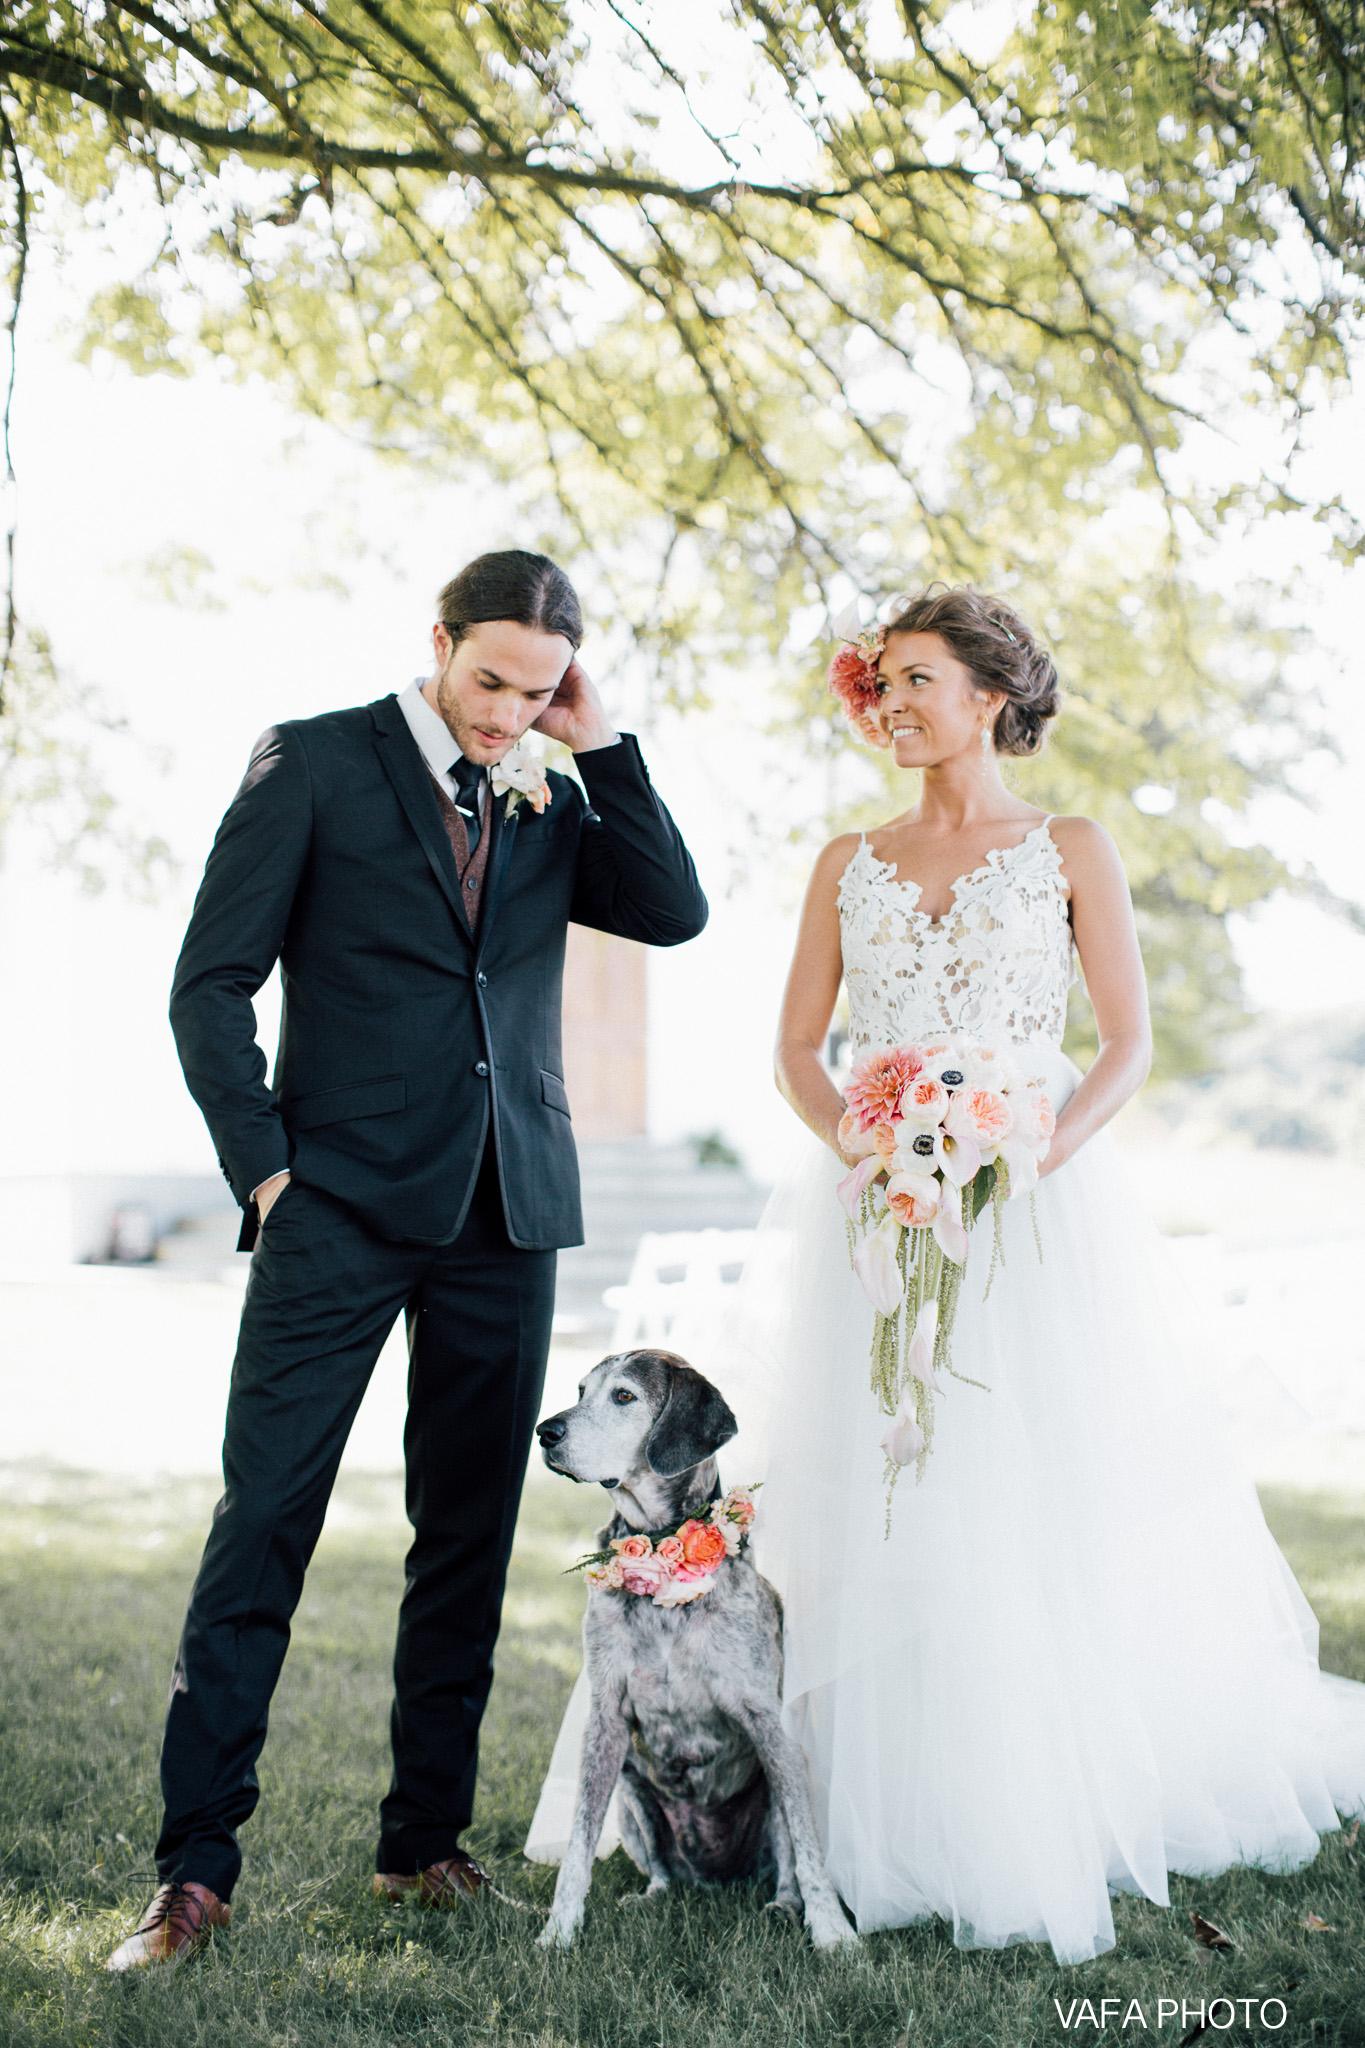 The-Felt-Estate-Wedding-Kailie-David-Vafa-Photo-536.jpg